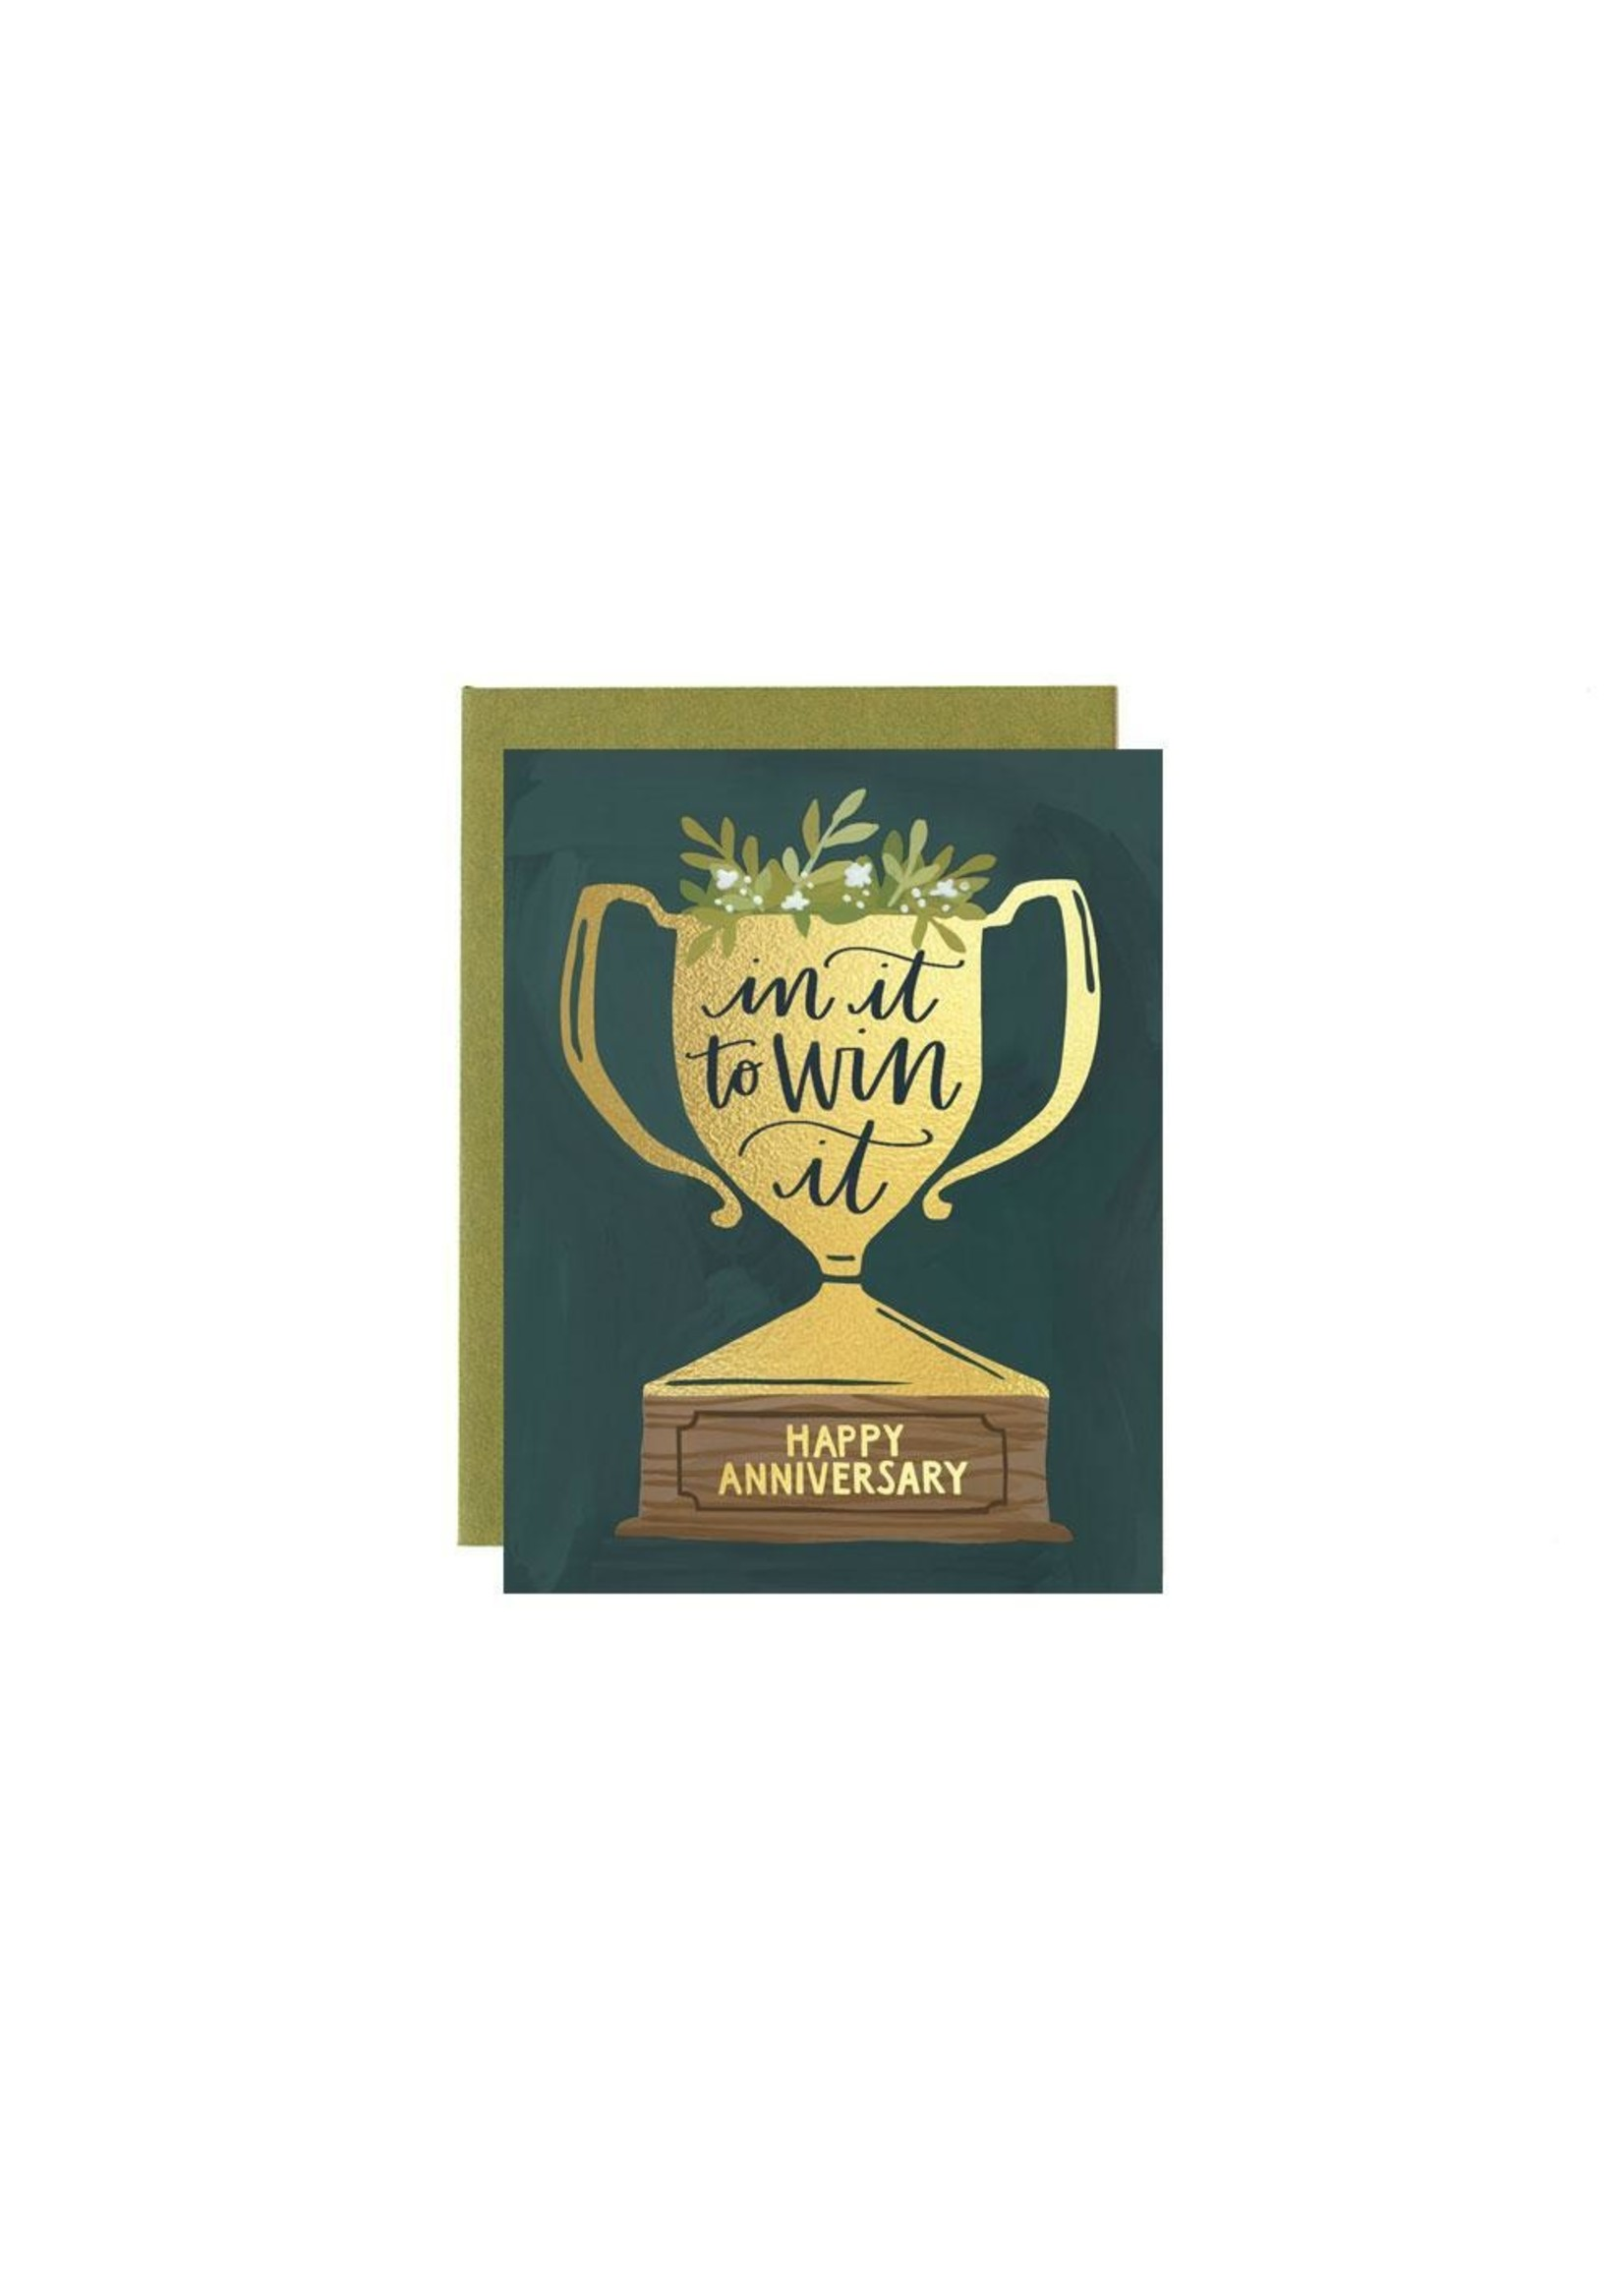 1 Canoe 2 Card Anniversary Trophy